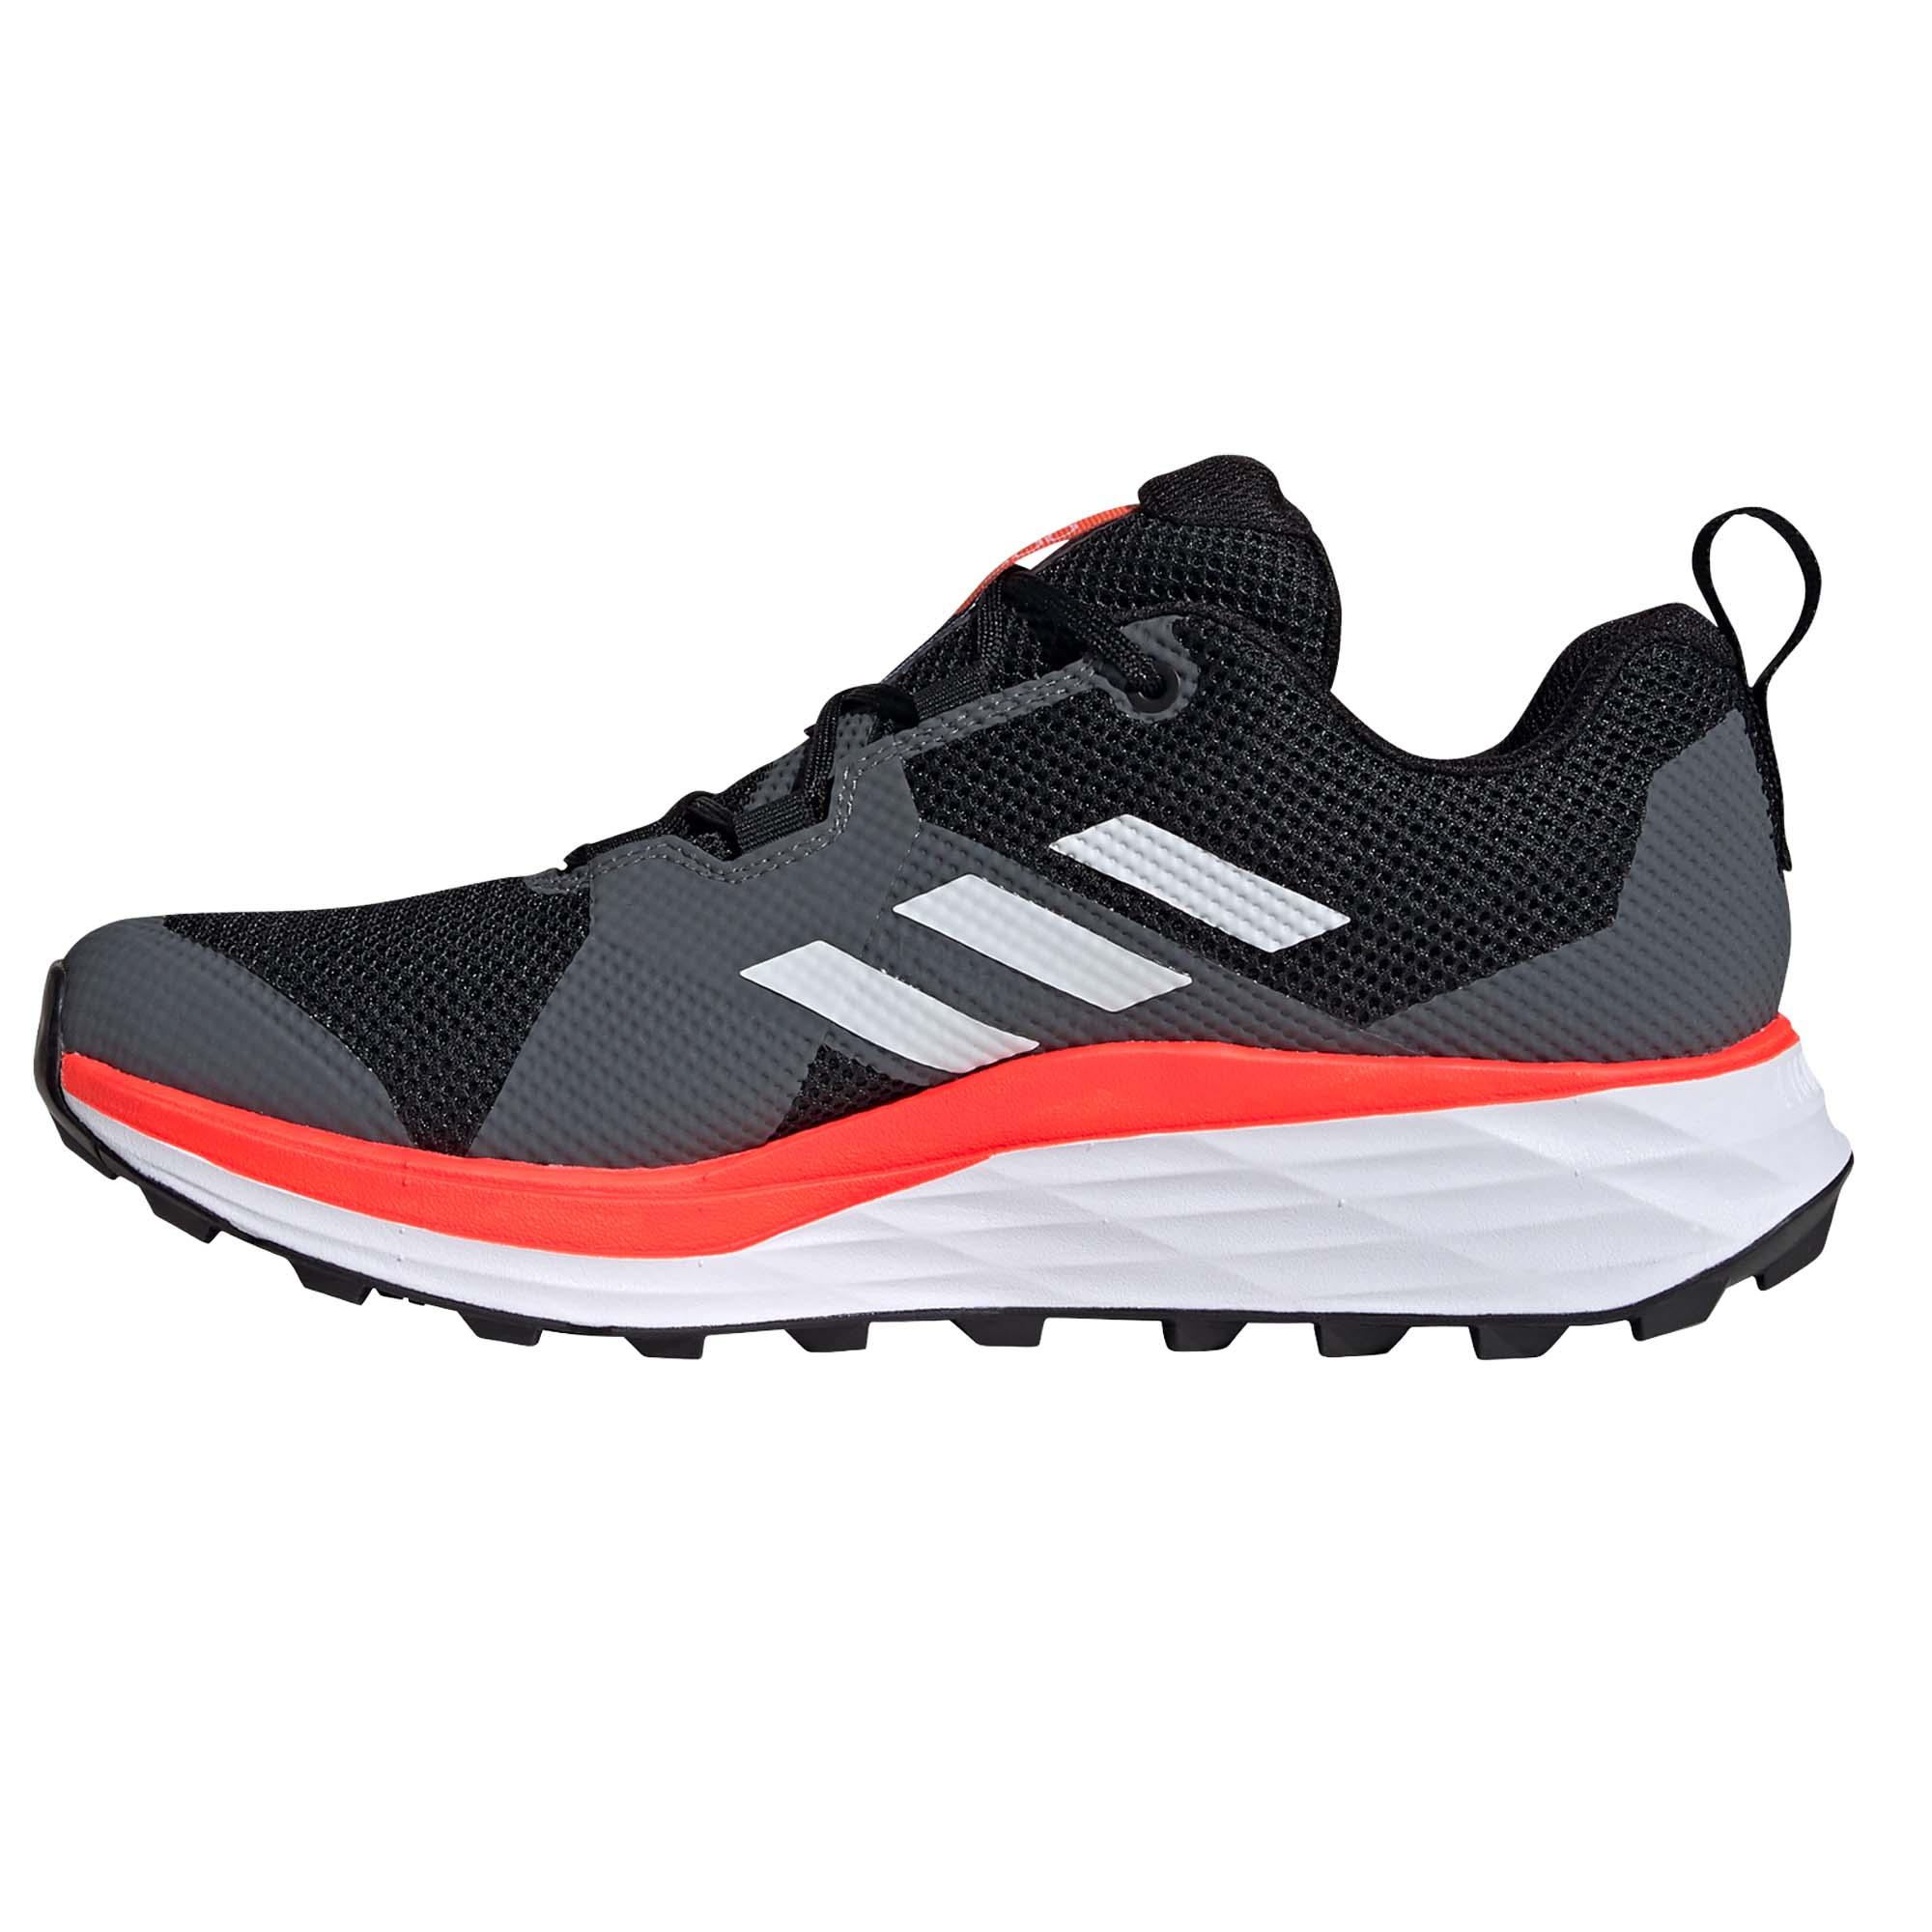 miniatura 8 - ADIDAS Terrex Due Da Uomo Scarpa Trail Running Scarpe da ginnastica nero/bianco/rosso